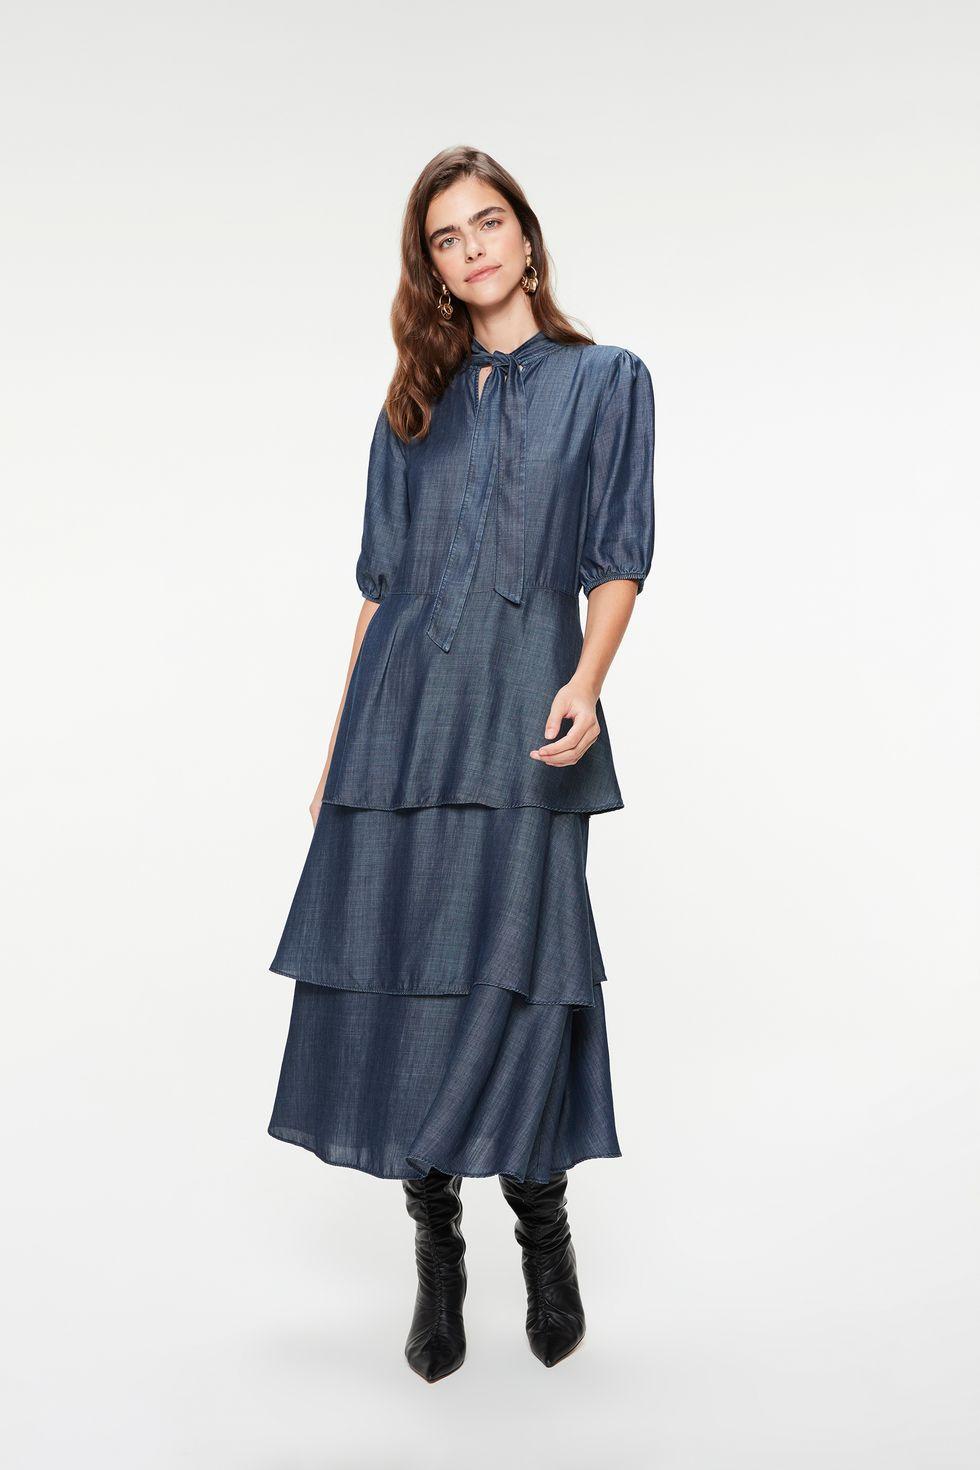 Vestido-Jeans-Midi-com-Babados-Gola-Laco-Frente--